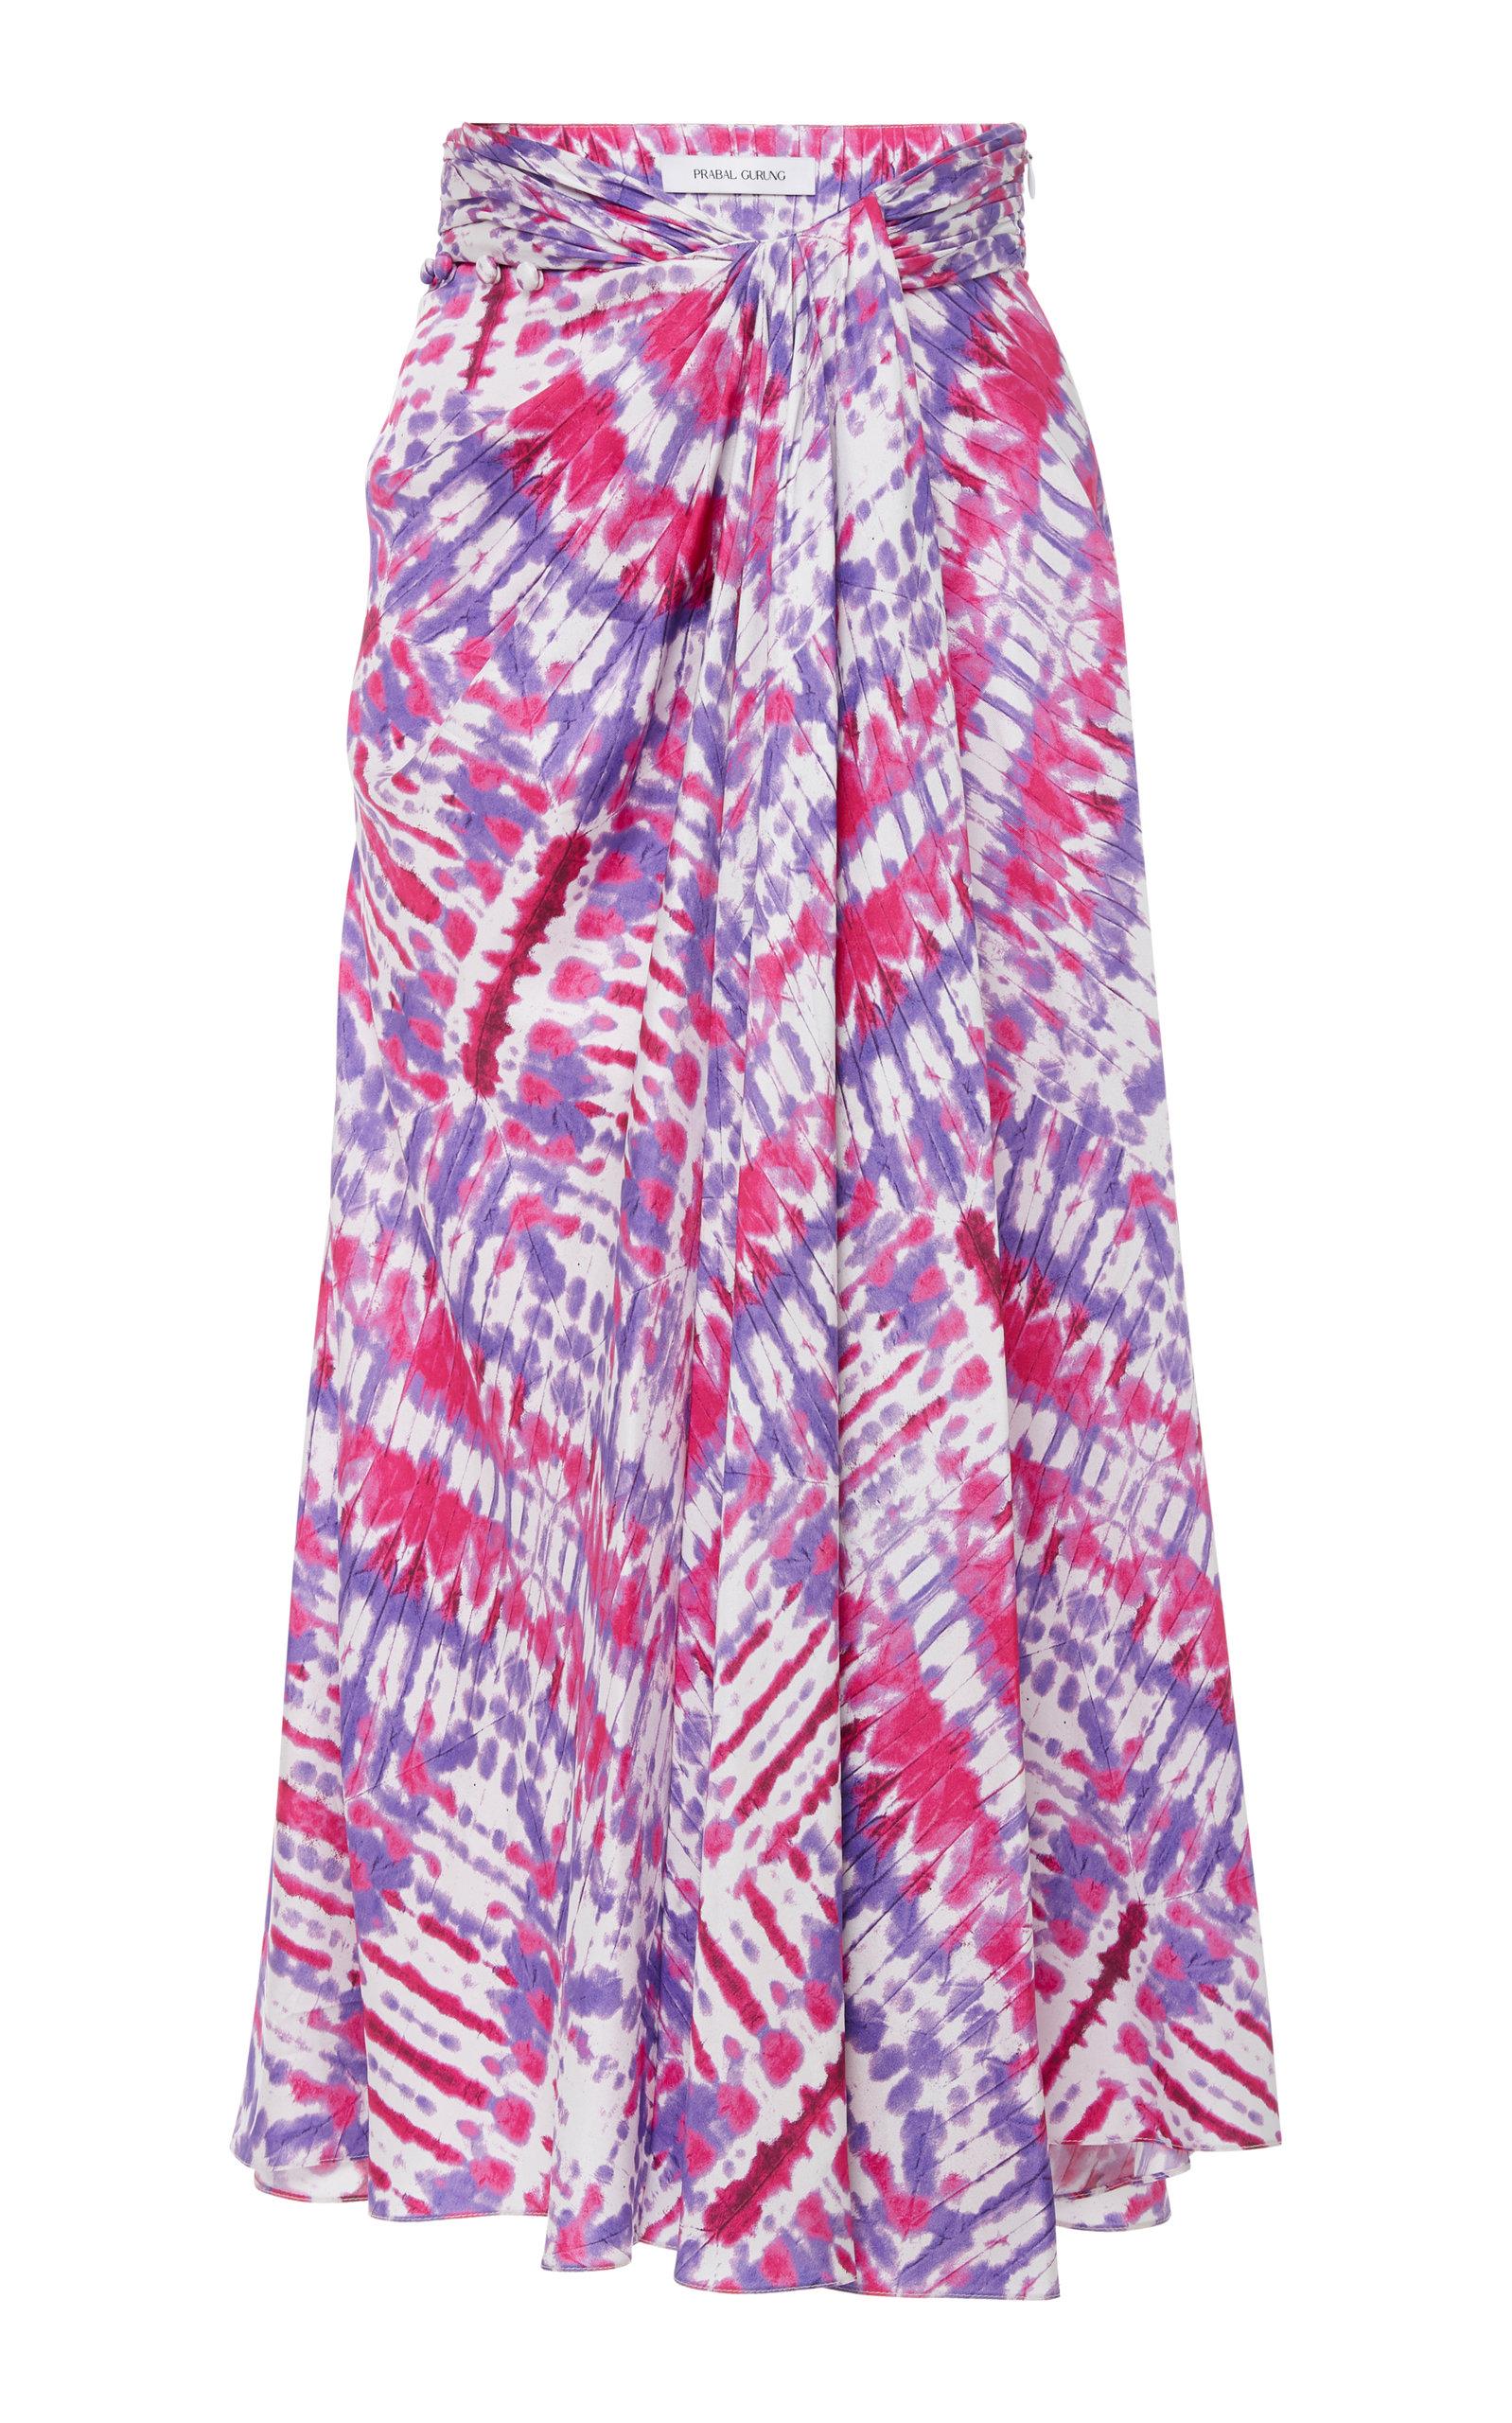 PRABAL GURUNG Wrap-Waist Tie-Dye Midi Skirt in Purple